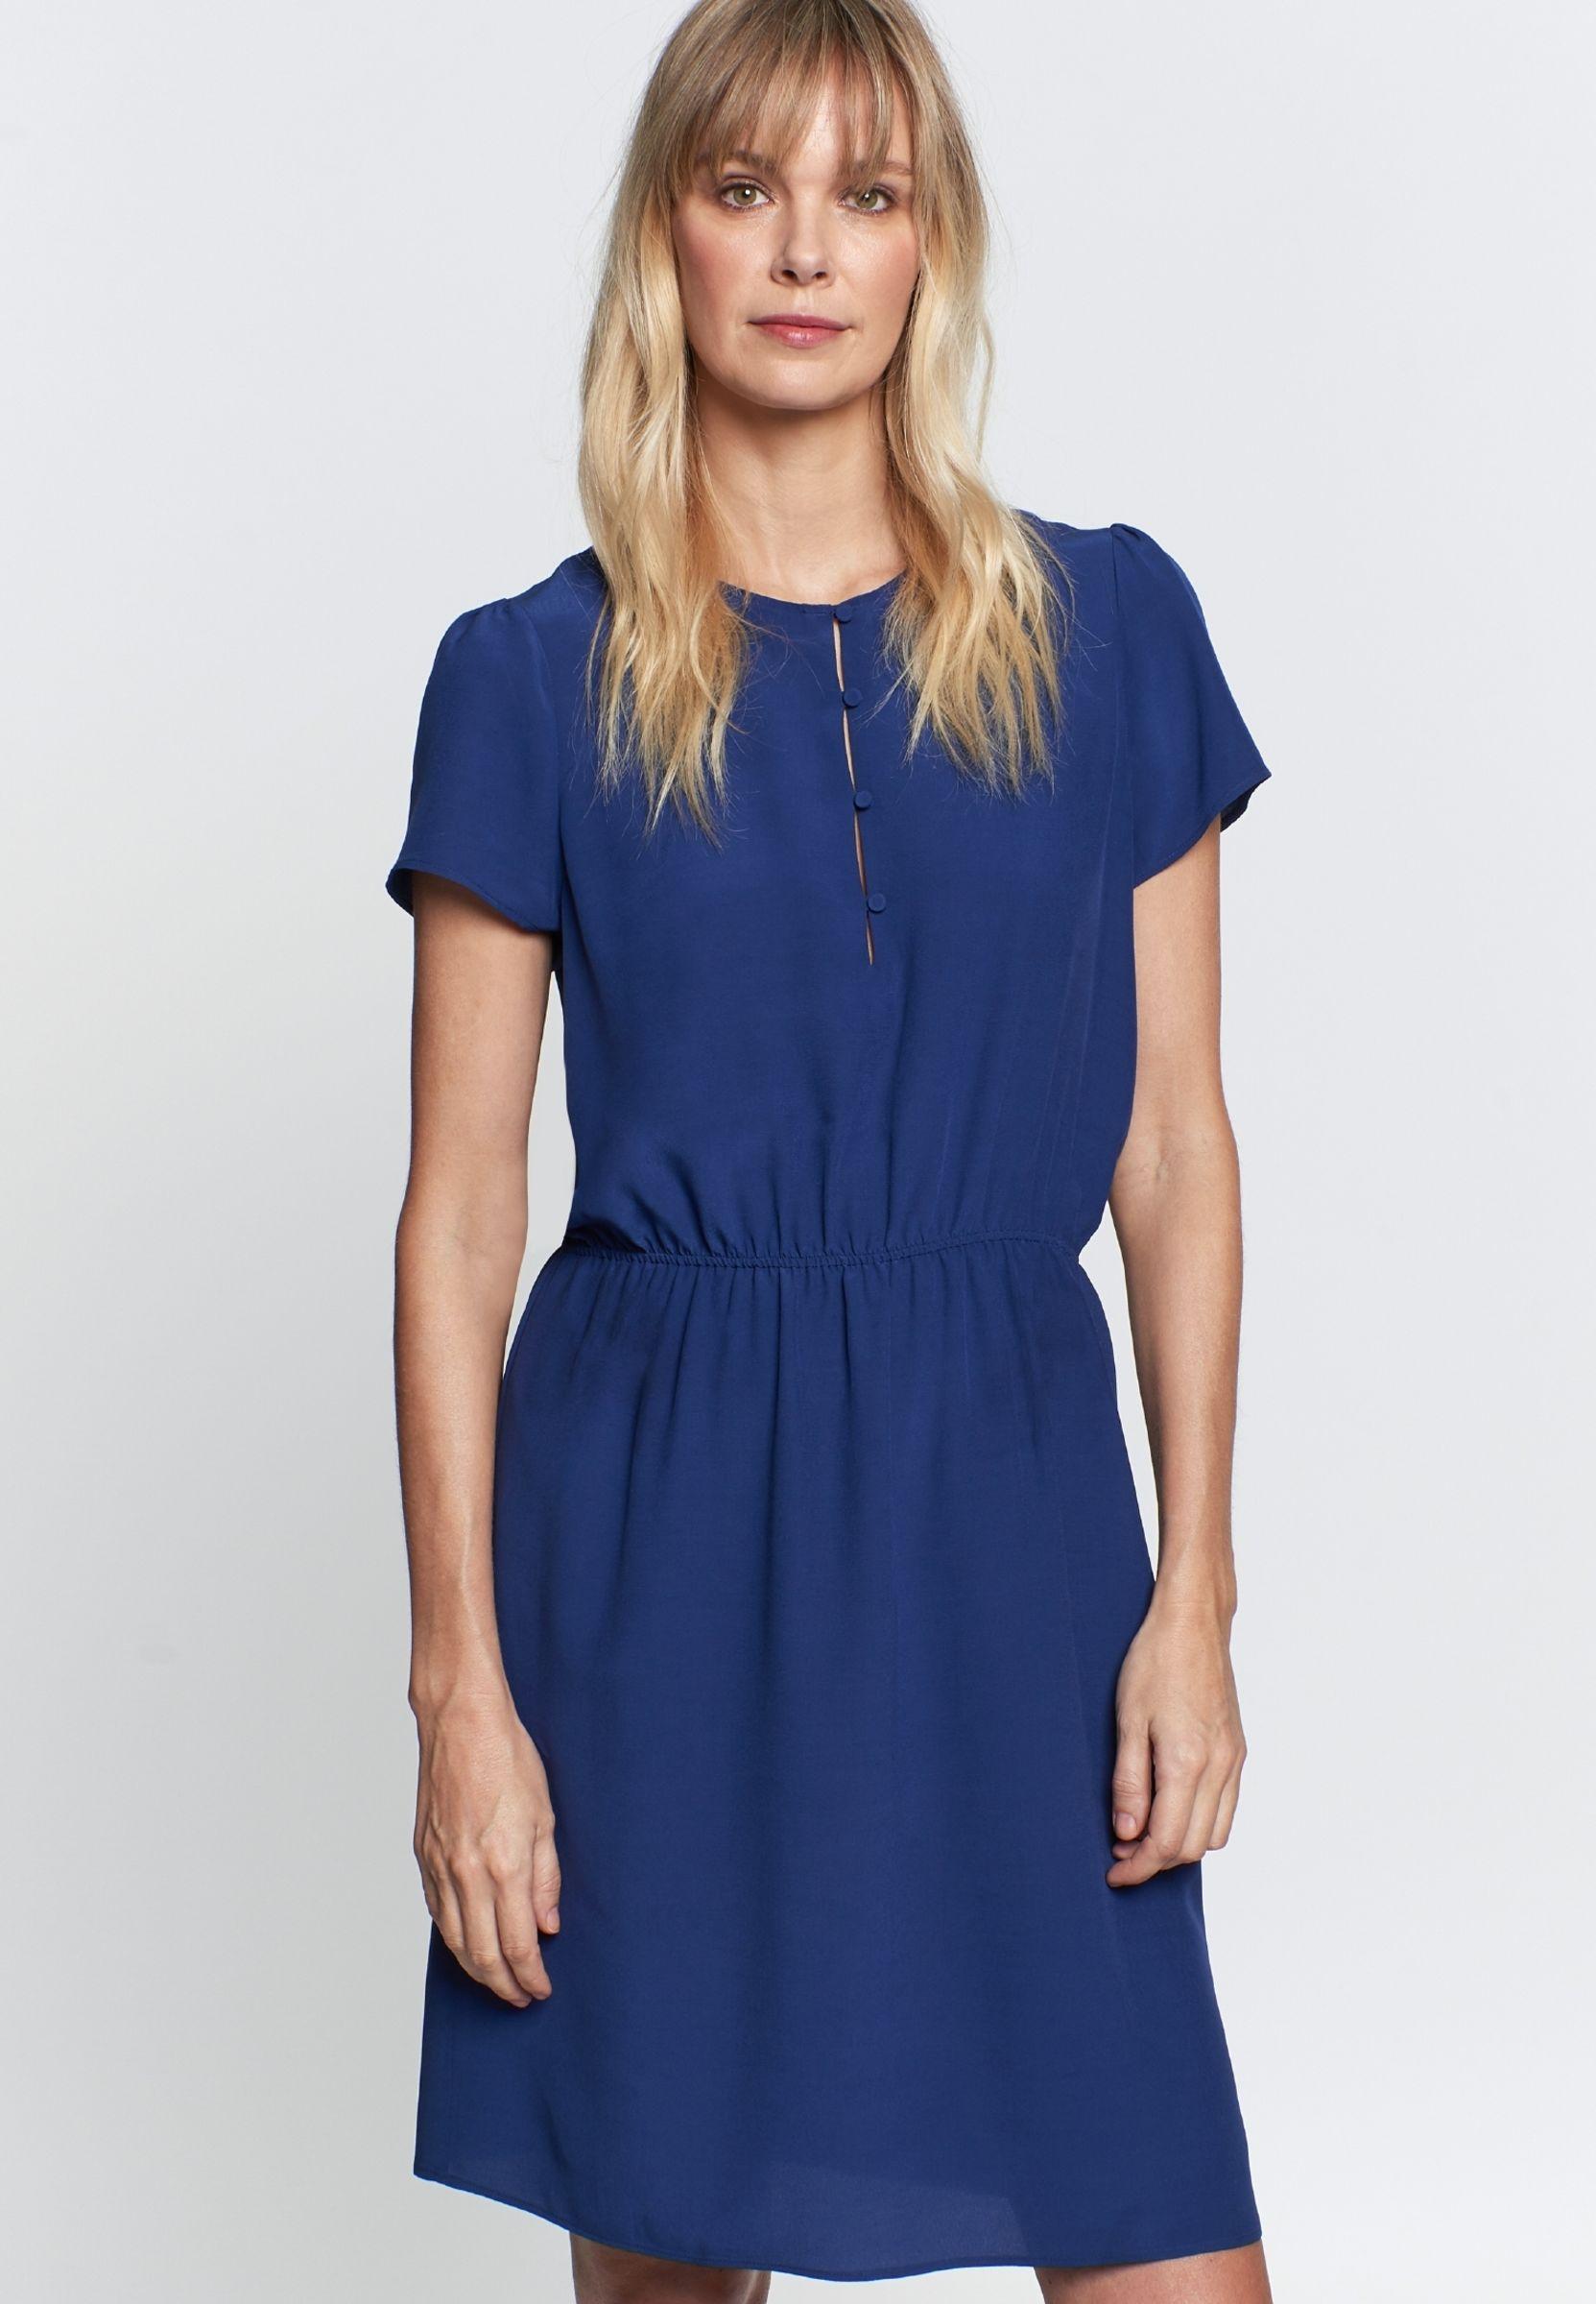 Damen Krepp Midi Kleid aus 100% Viskose mittelblau 60 ...